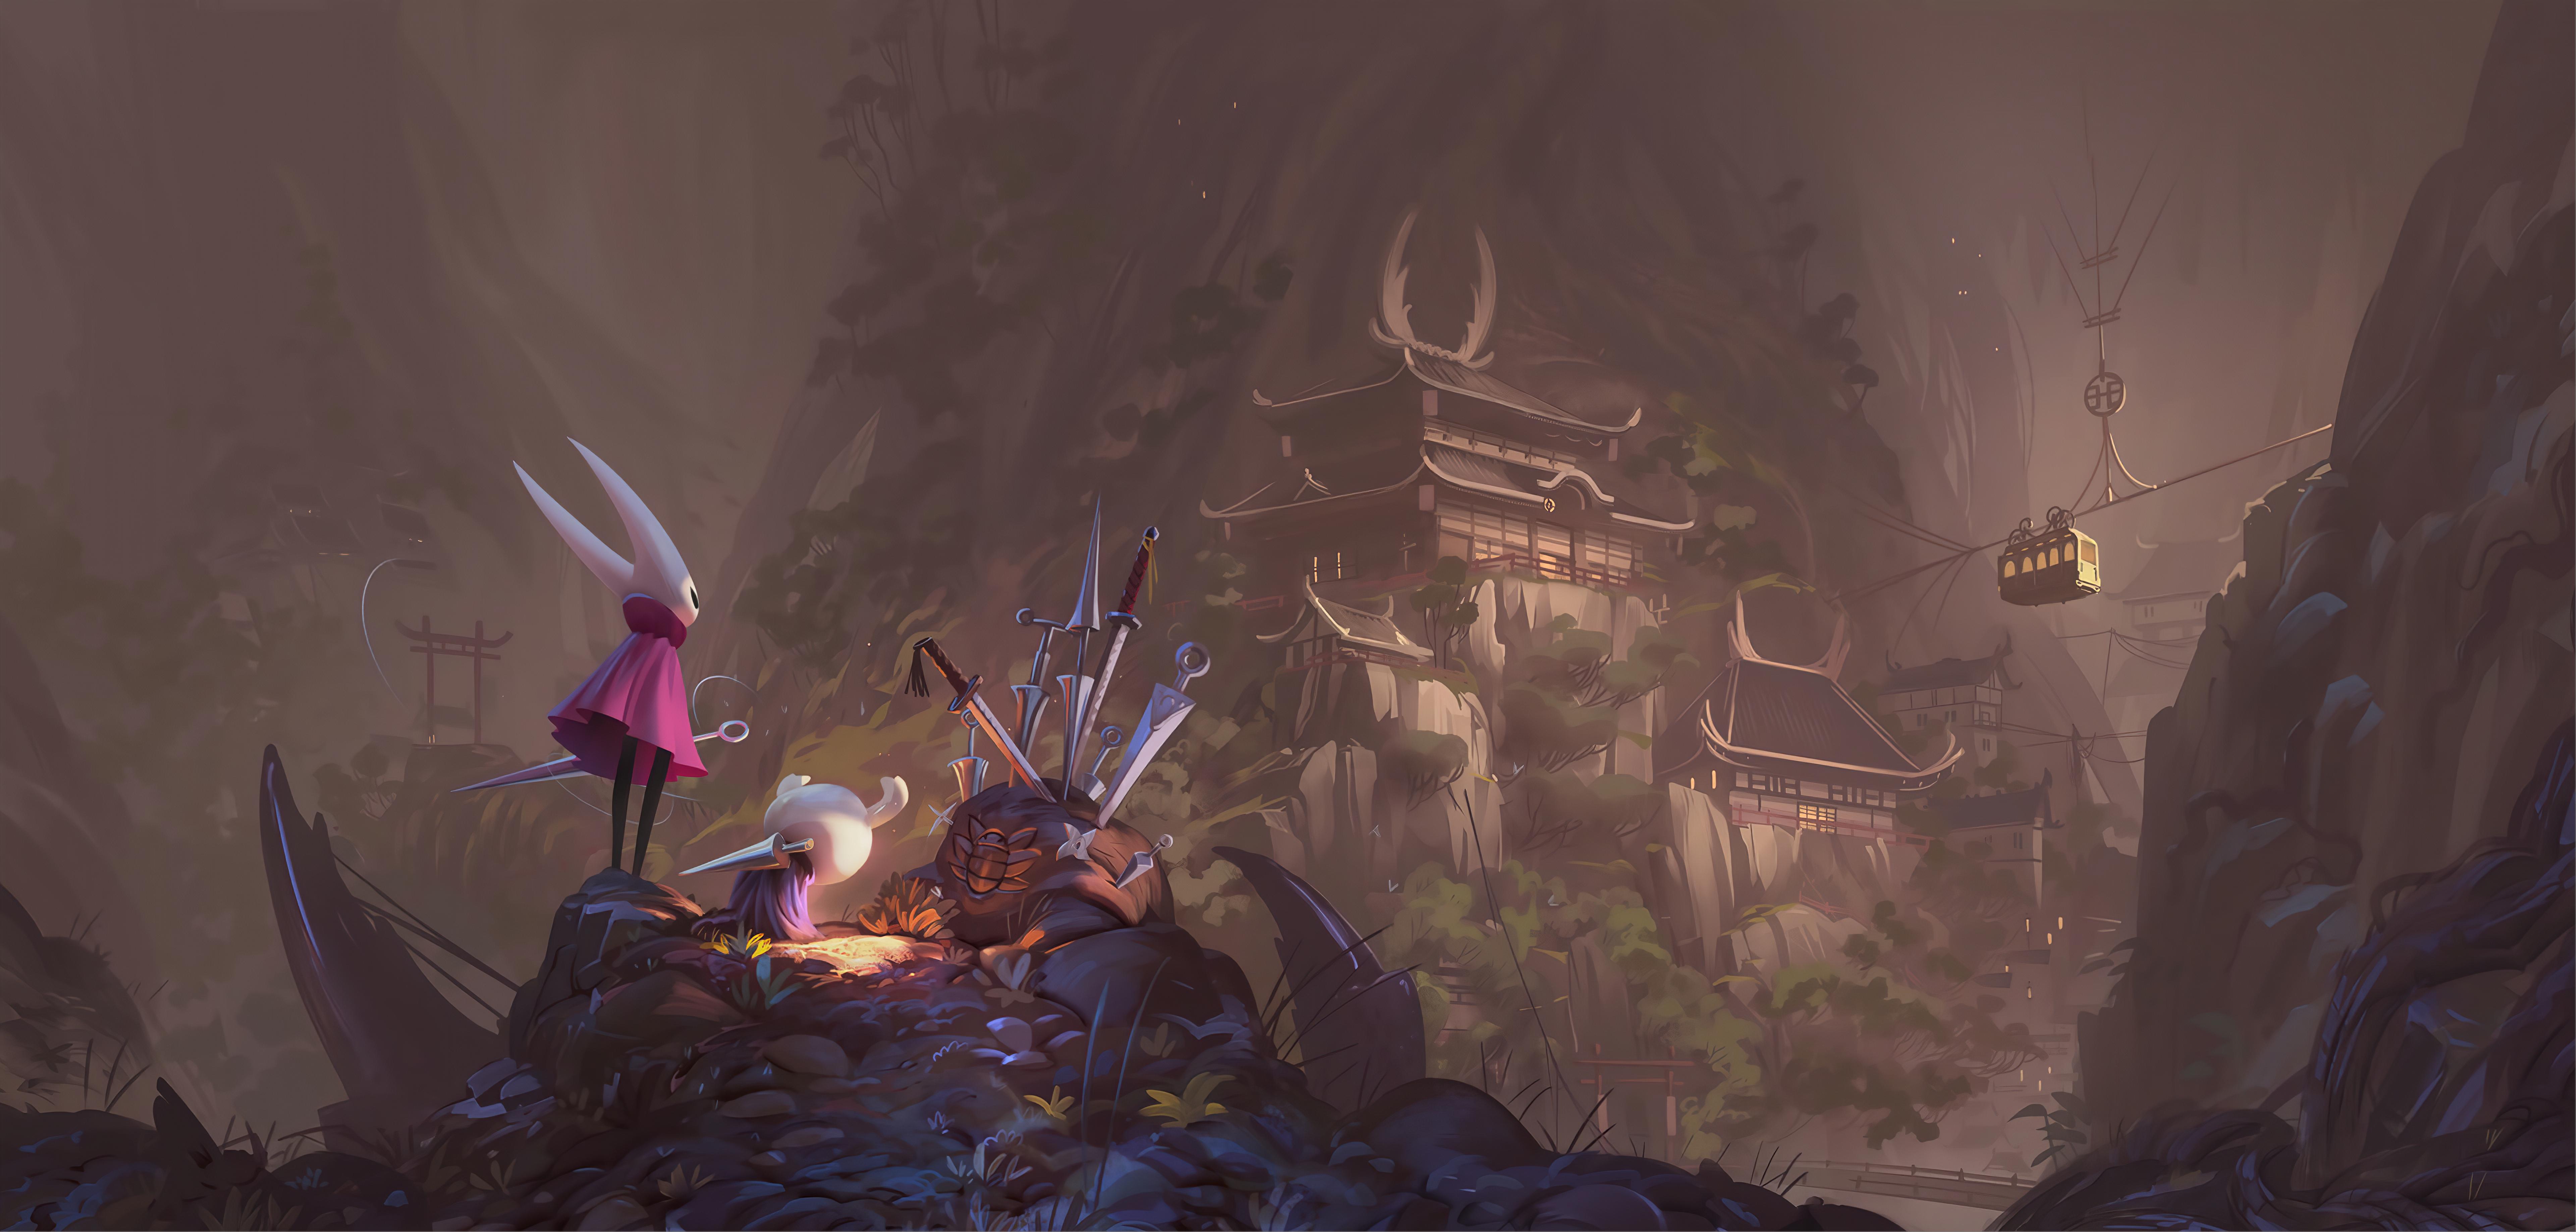 2560x1080 Final Fantasy Xv Artwork 2560x1080 Resolution Hd: 2560x1080 Vincent Bisschop Hollow Knight Fantasy Art 8k